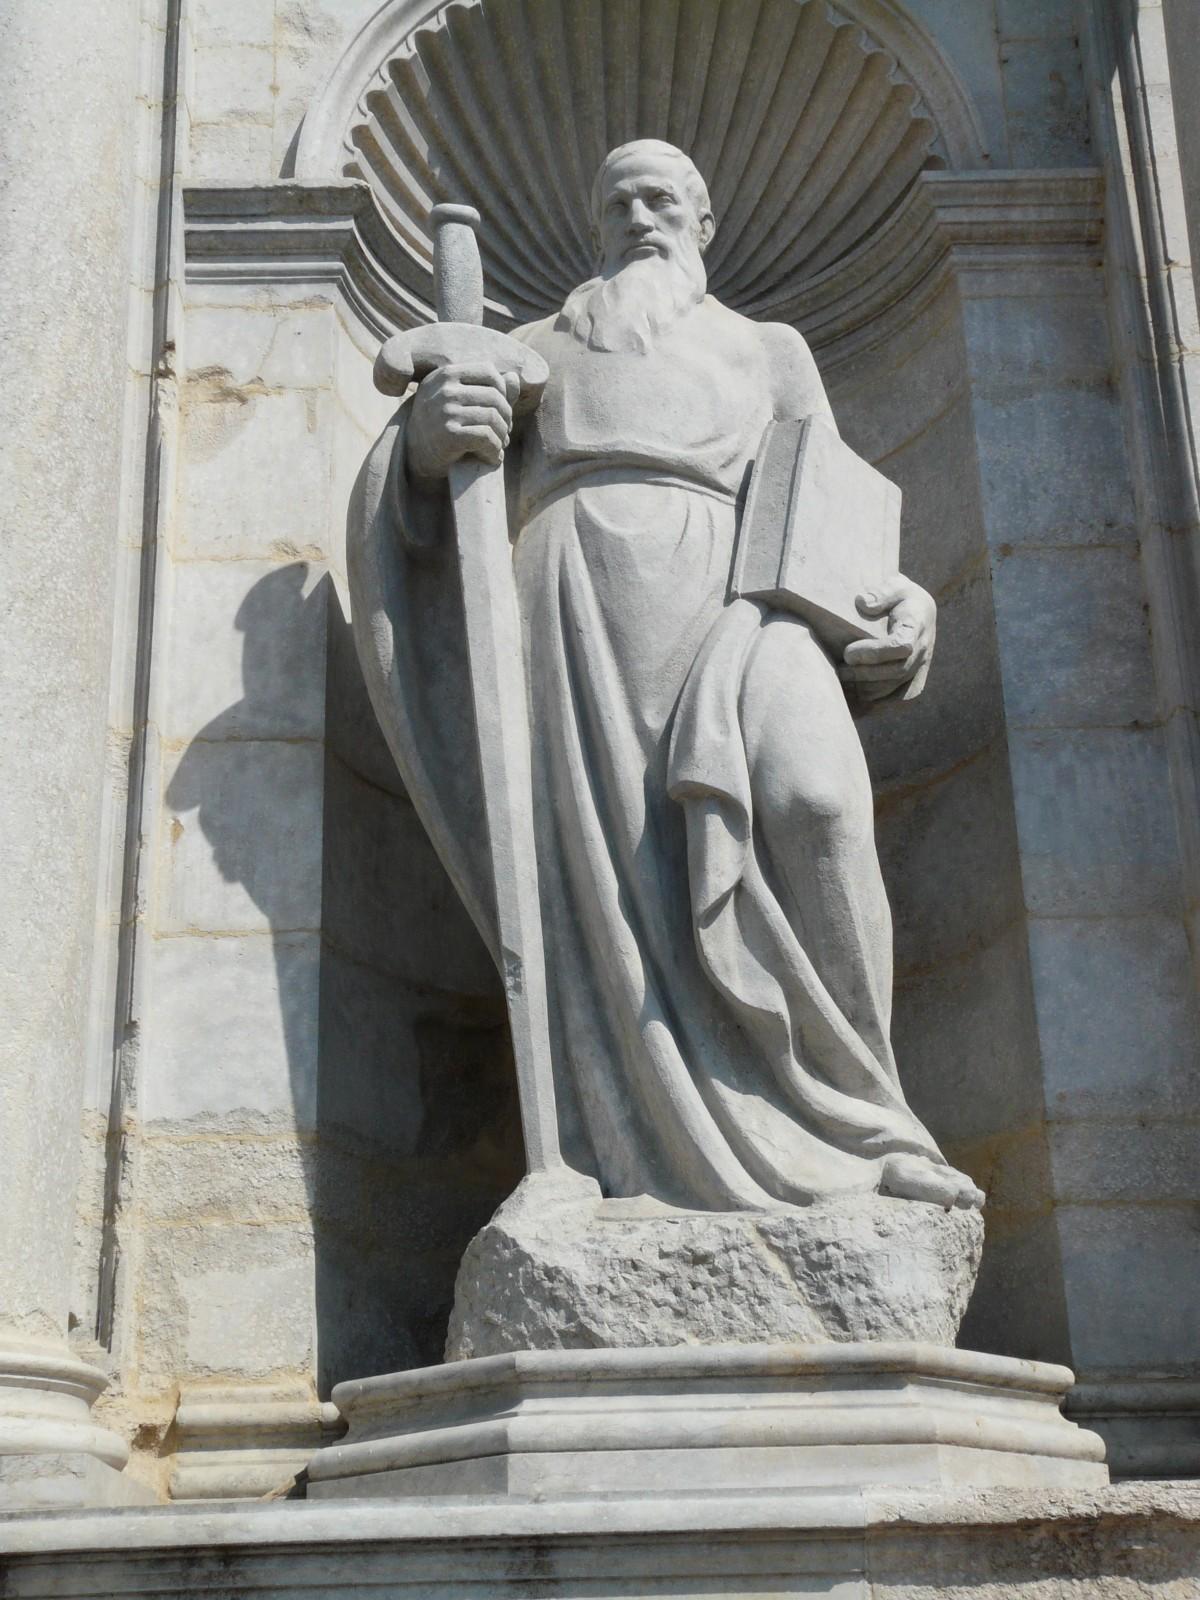 hombre libro piedra monumento estatua humano